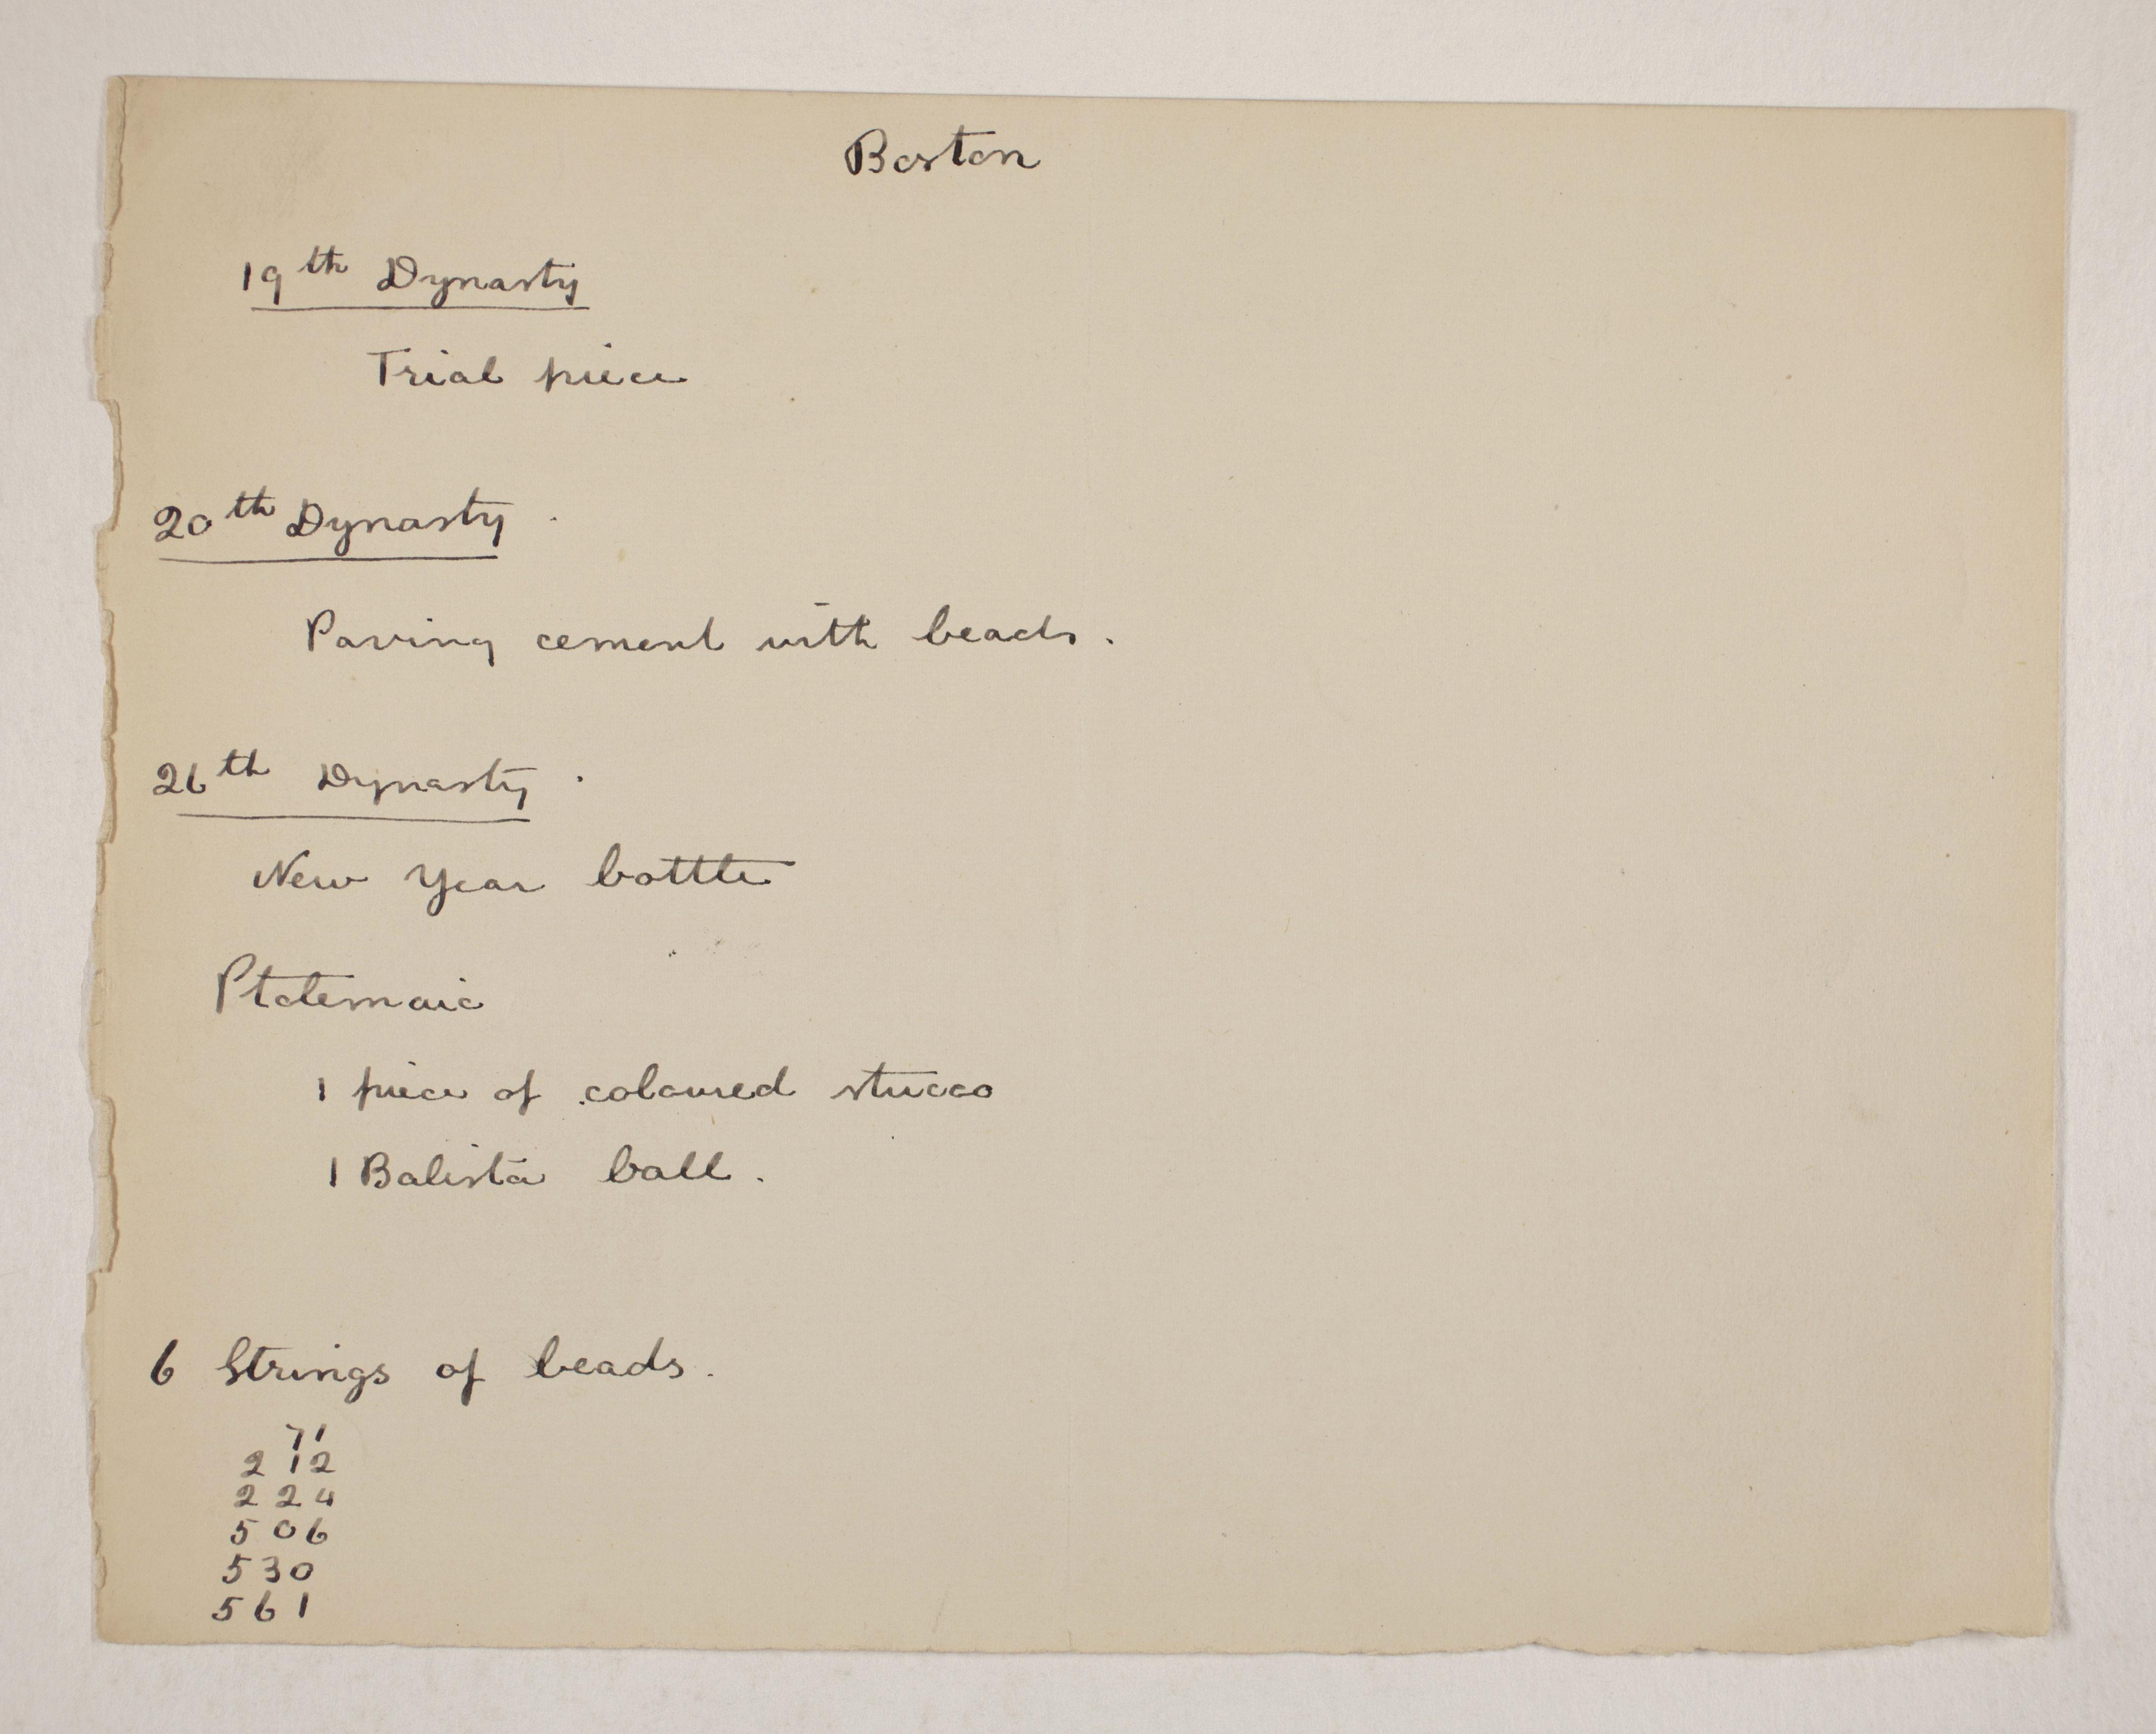 1905-06 Eastern Delta: Belbeis, Tell el-Rataba, Saft el-Hinna, Tell el-Yahudiya, Shaghanbeh, Ghita Individual institution list  PMA/WFP1/D/14/4